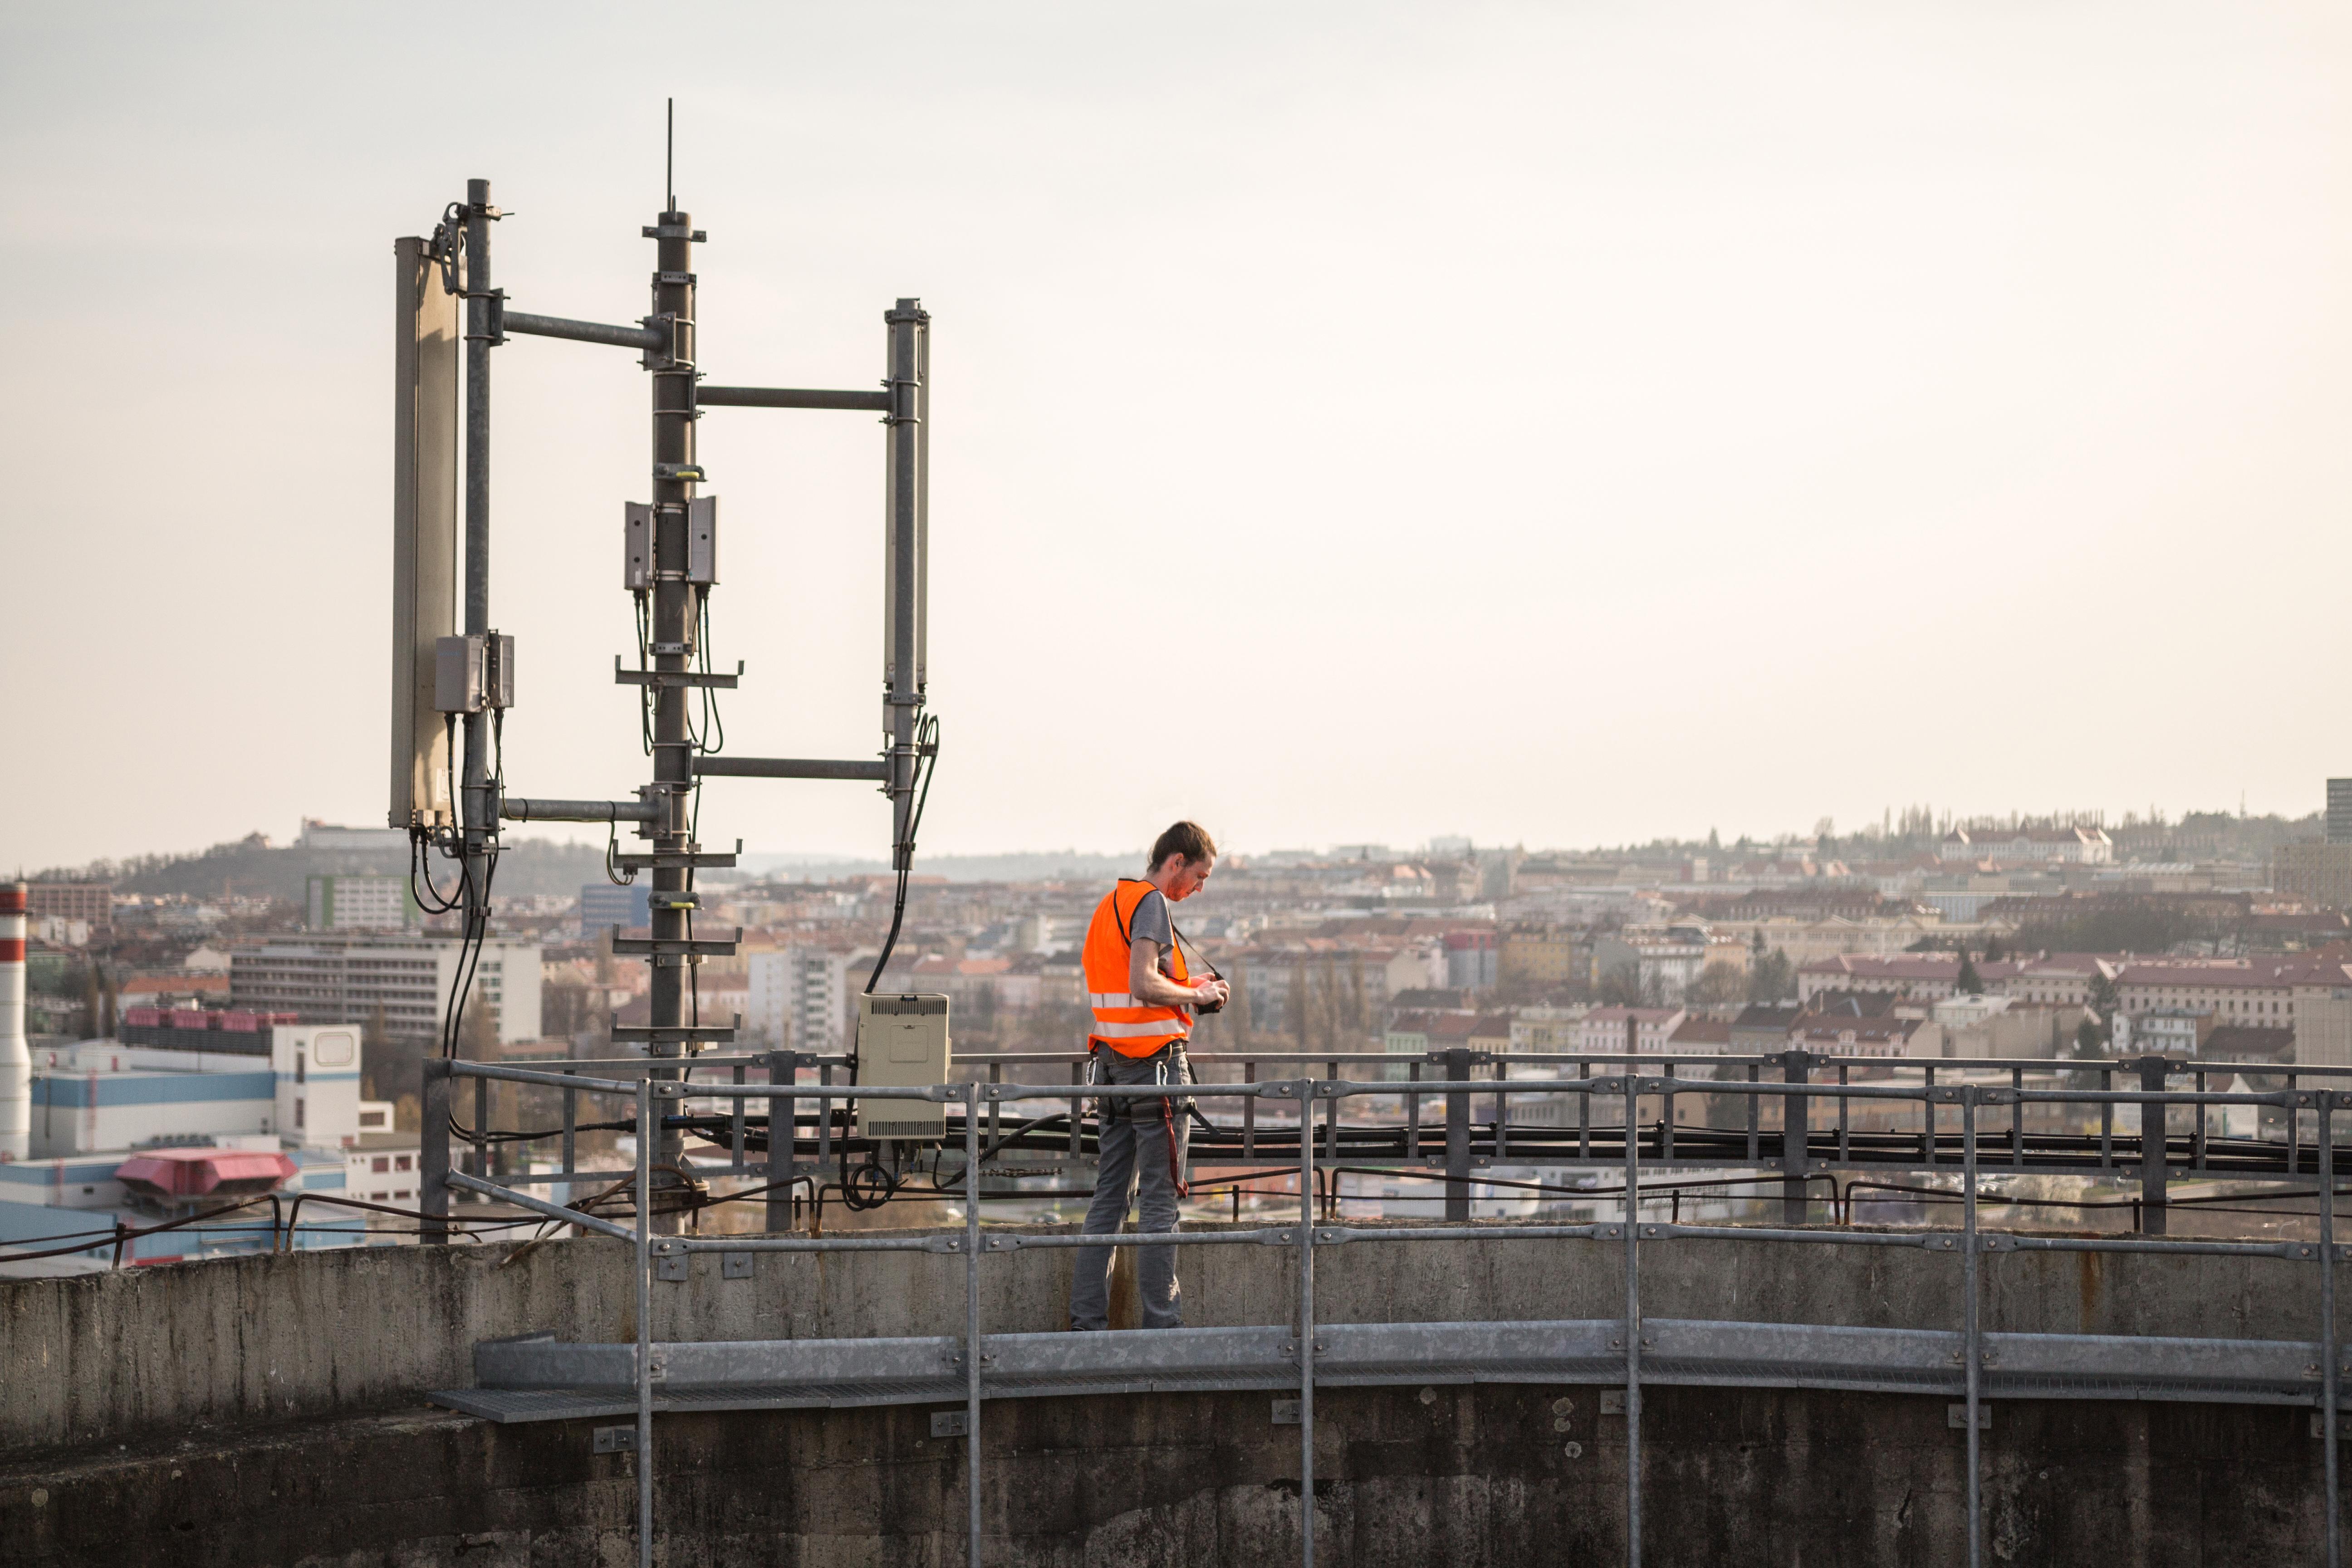 A telecom technician working on a base station